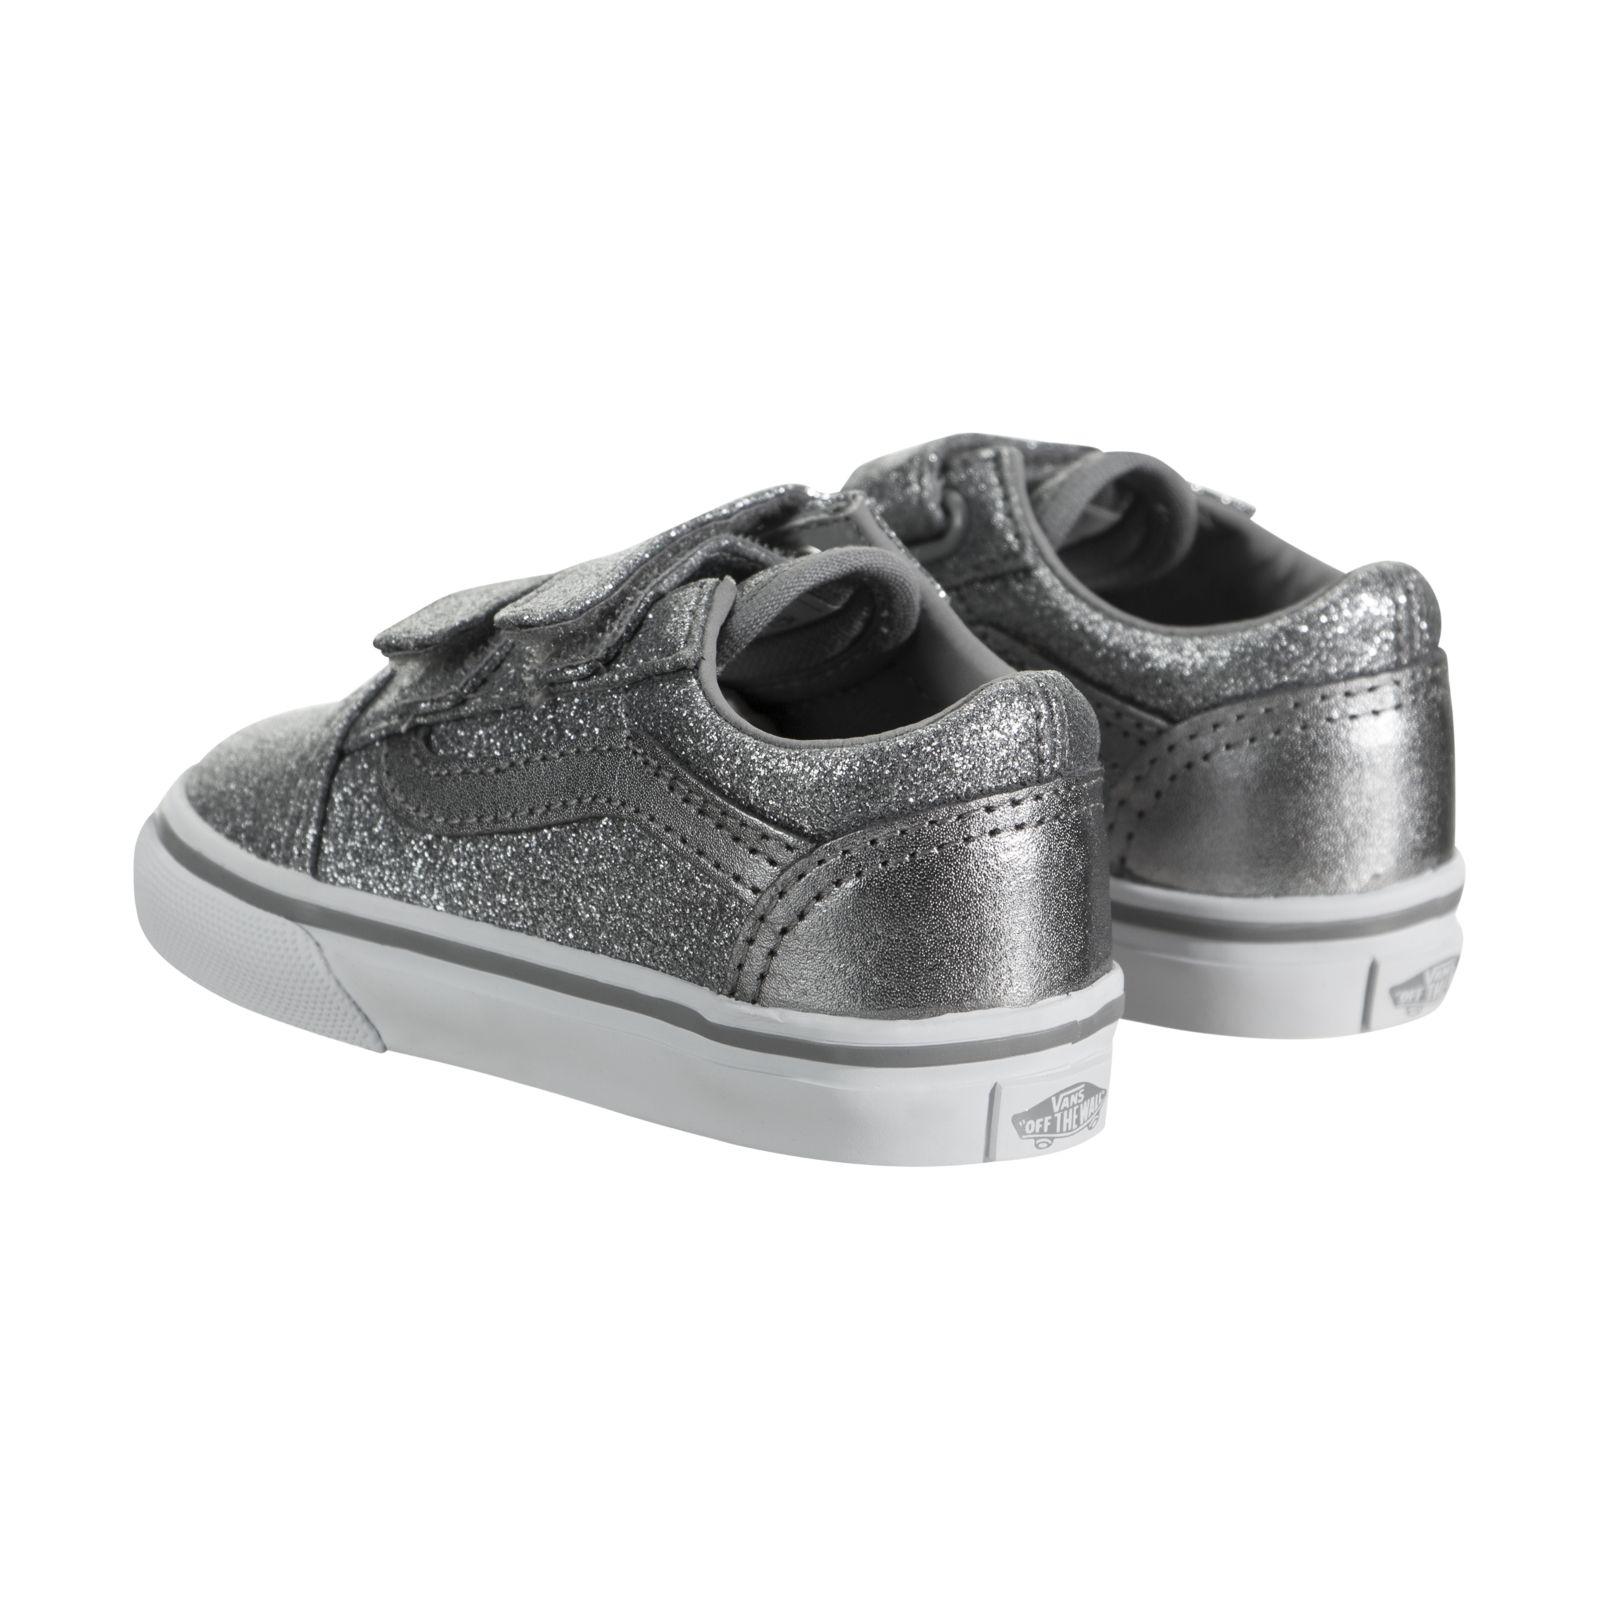 0f7caea13c68bc VANS Toddlers Old Skool V Glitter Metallic Frost Gray Skate Shoe 10 ...